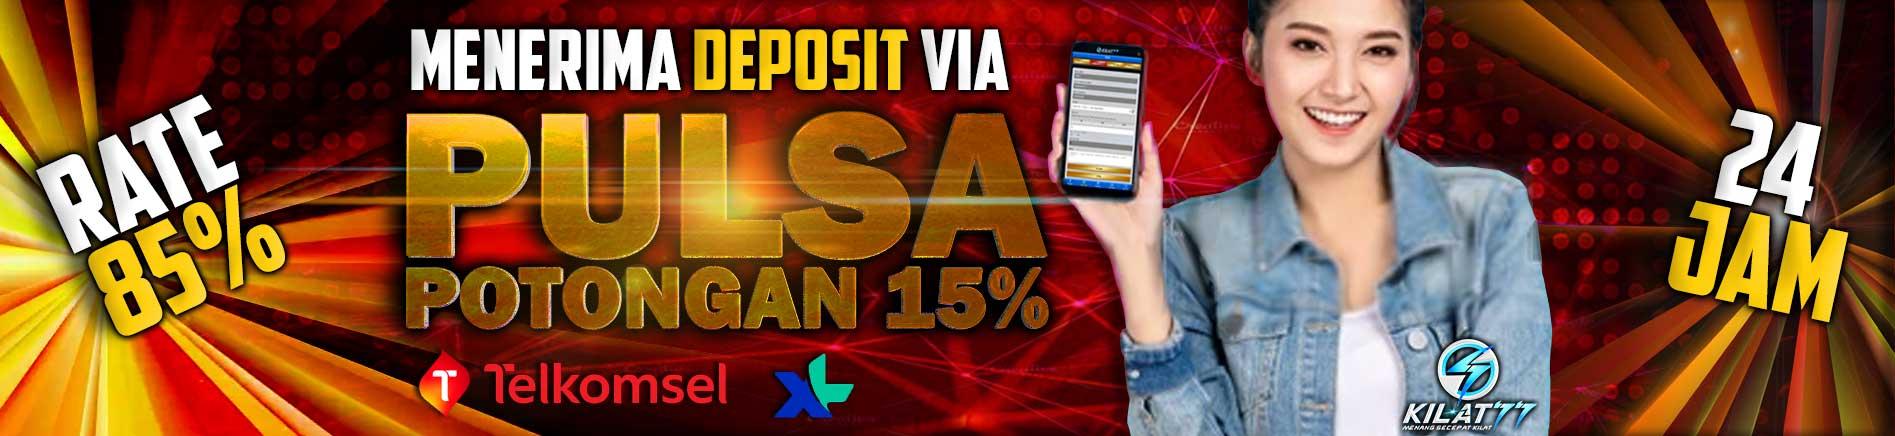 Deposit Pulsa rate 85%